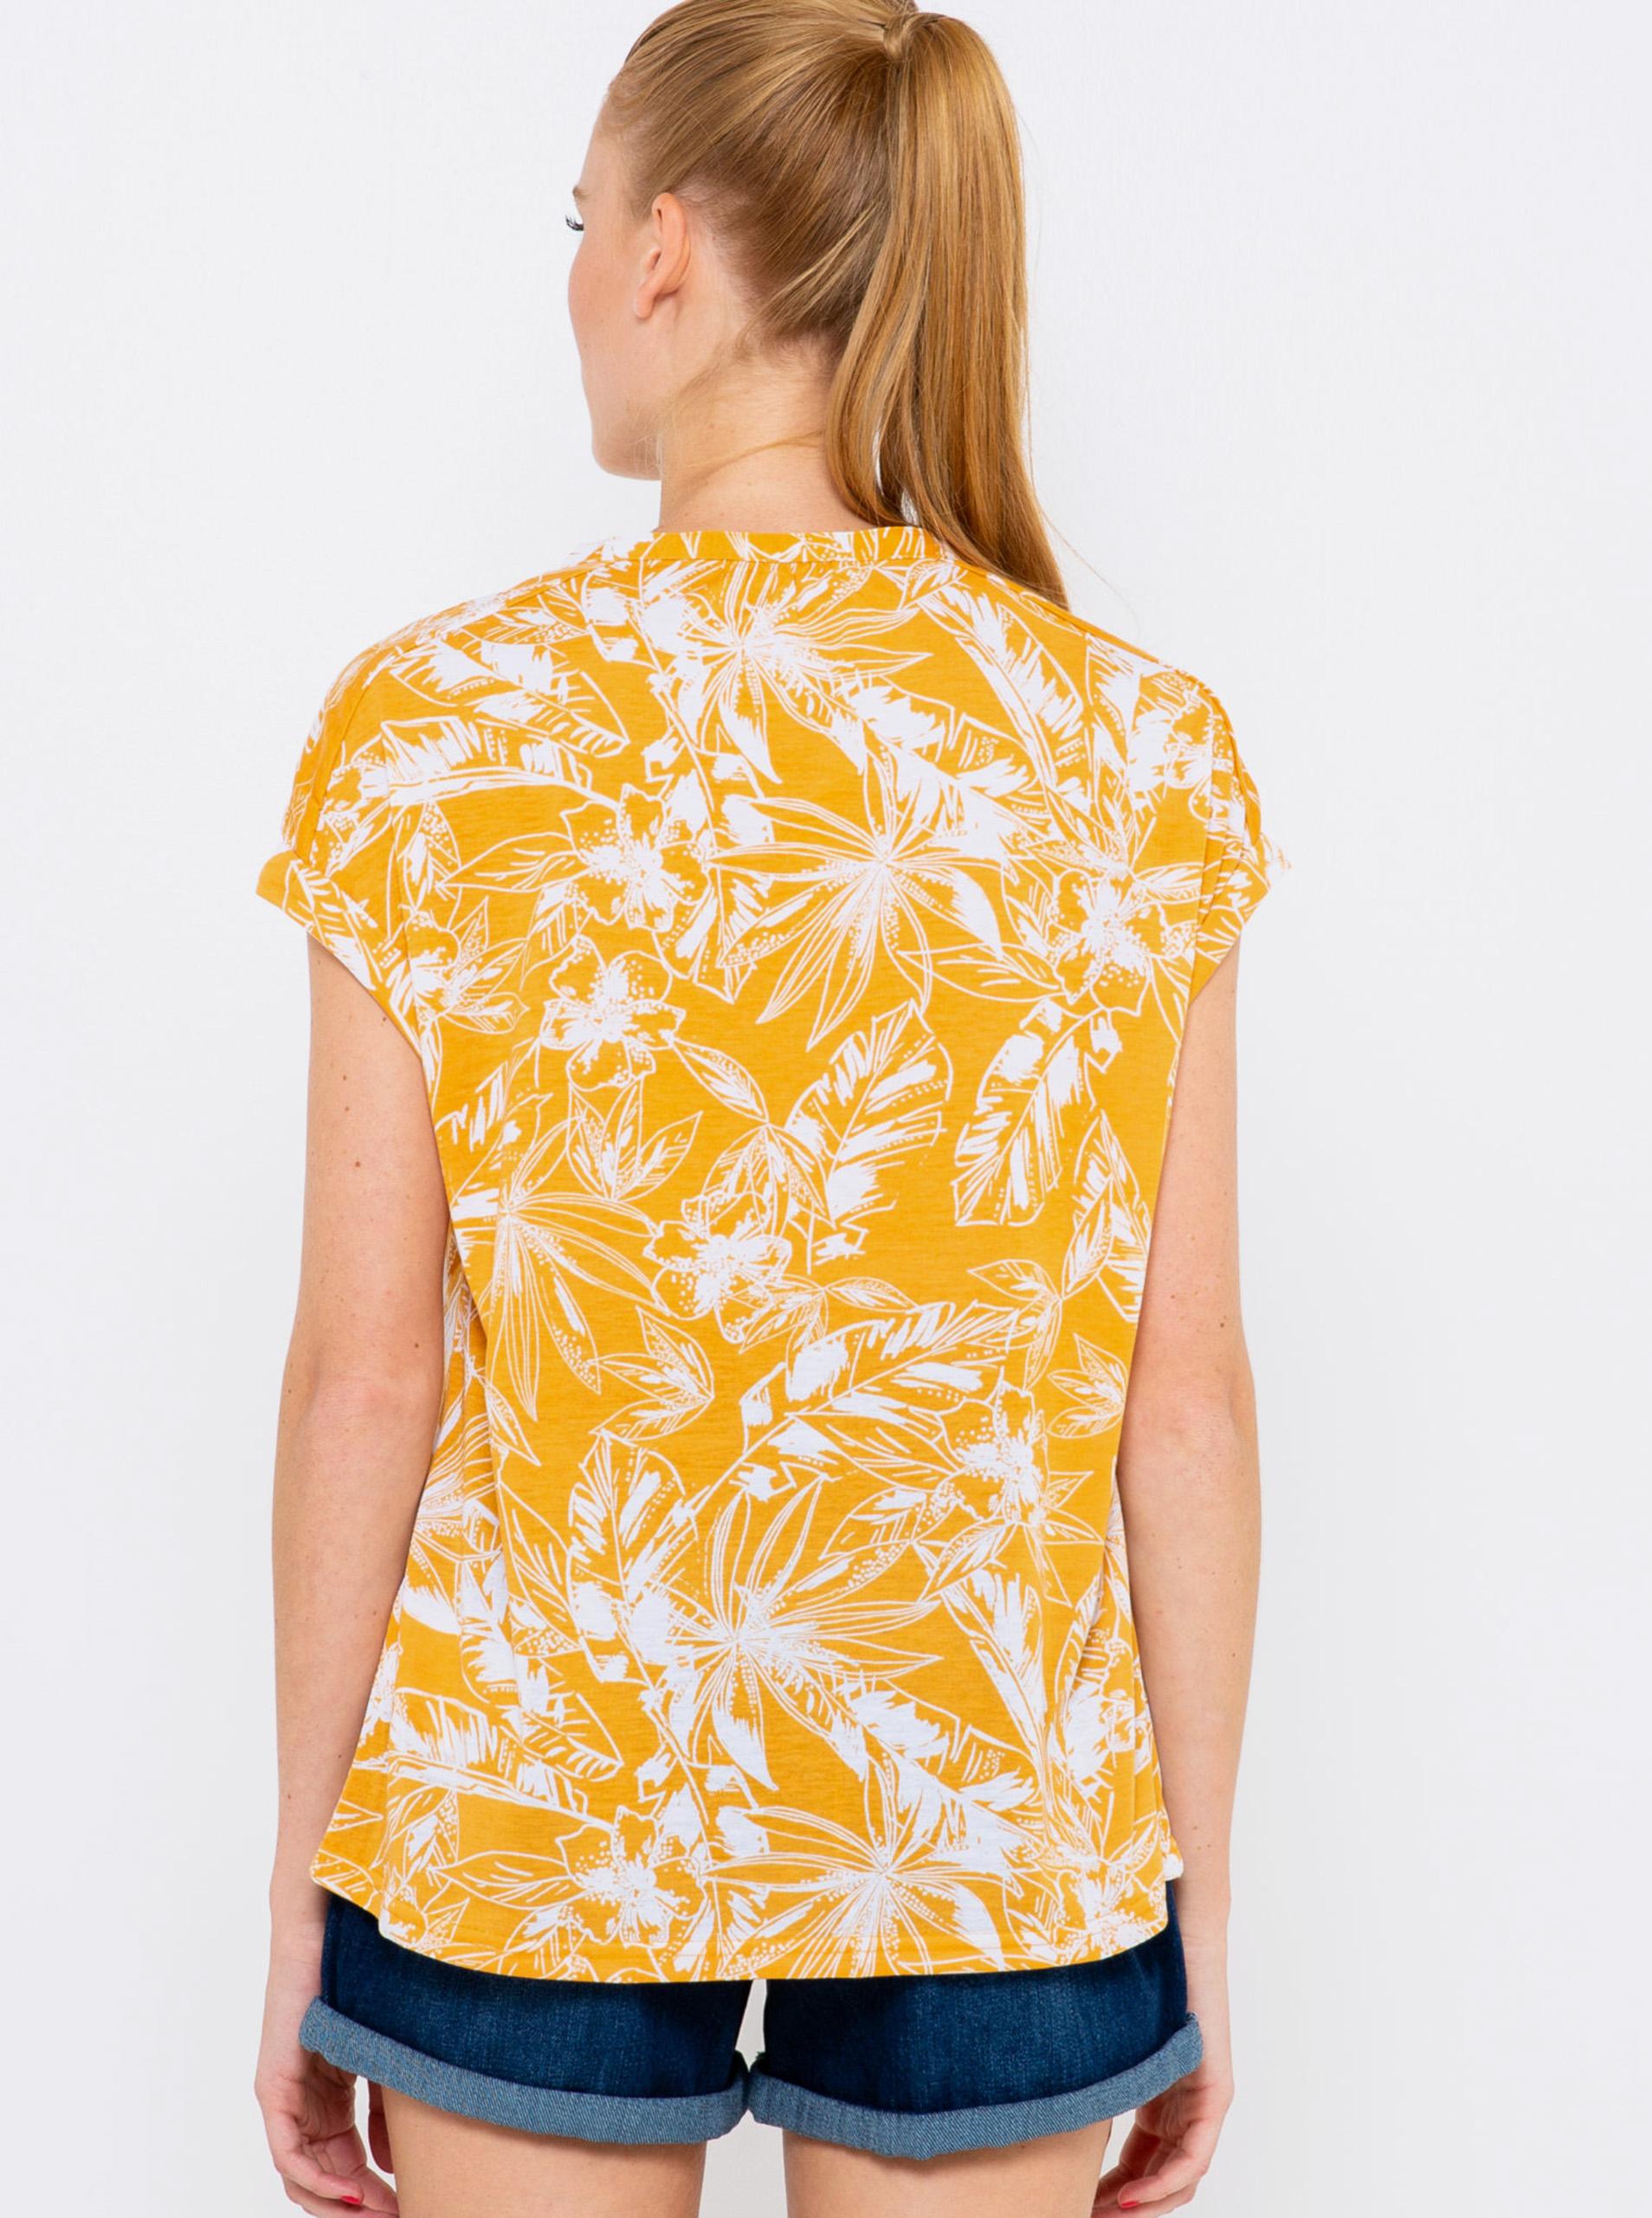 CAMAIEU bluză cu motiv floral